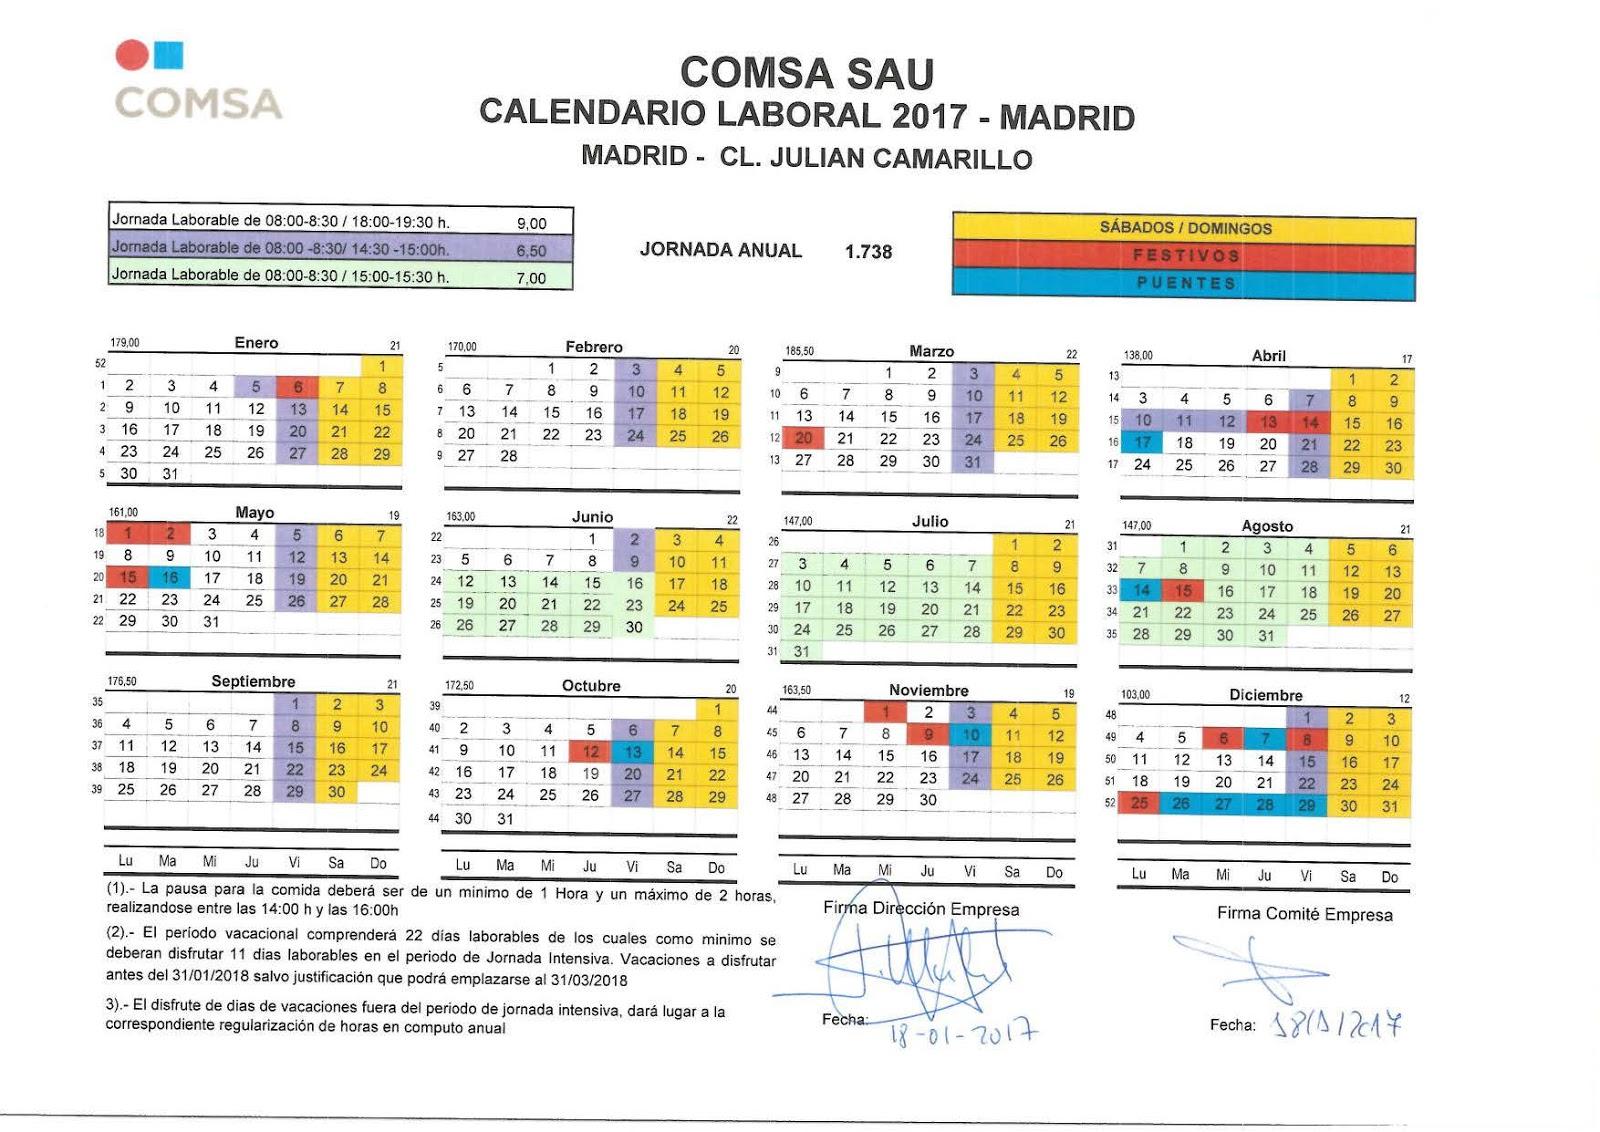 Comit empresa comsa madrid calendario laboral 2017 for Convenio oficinas madrid 2017